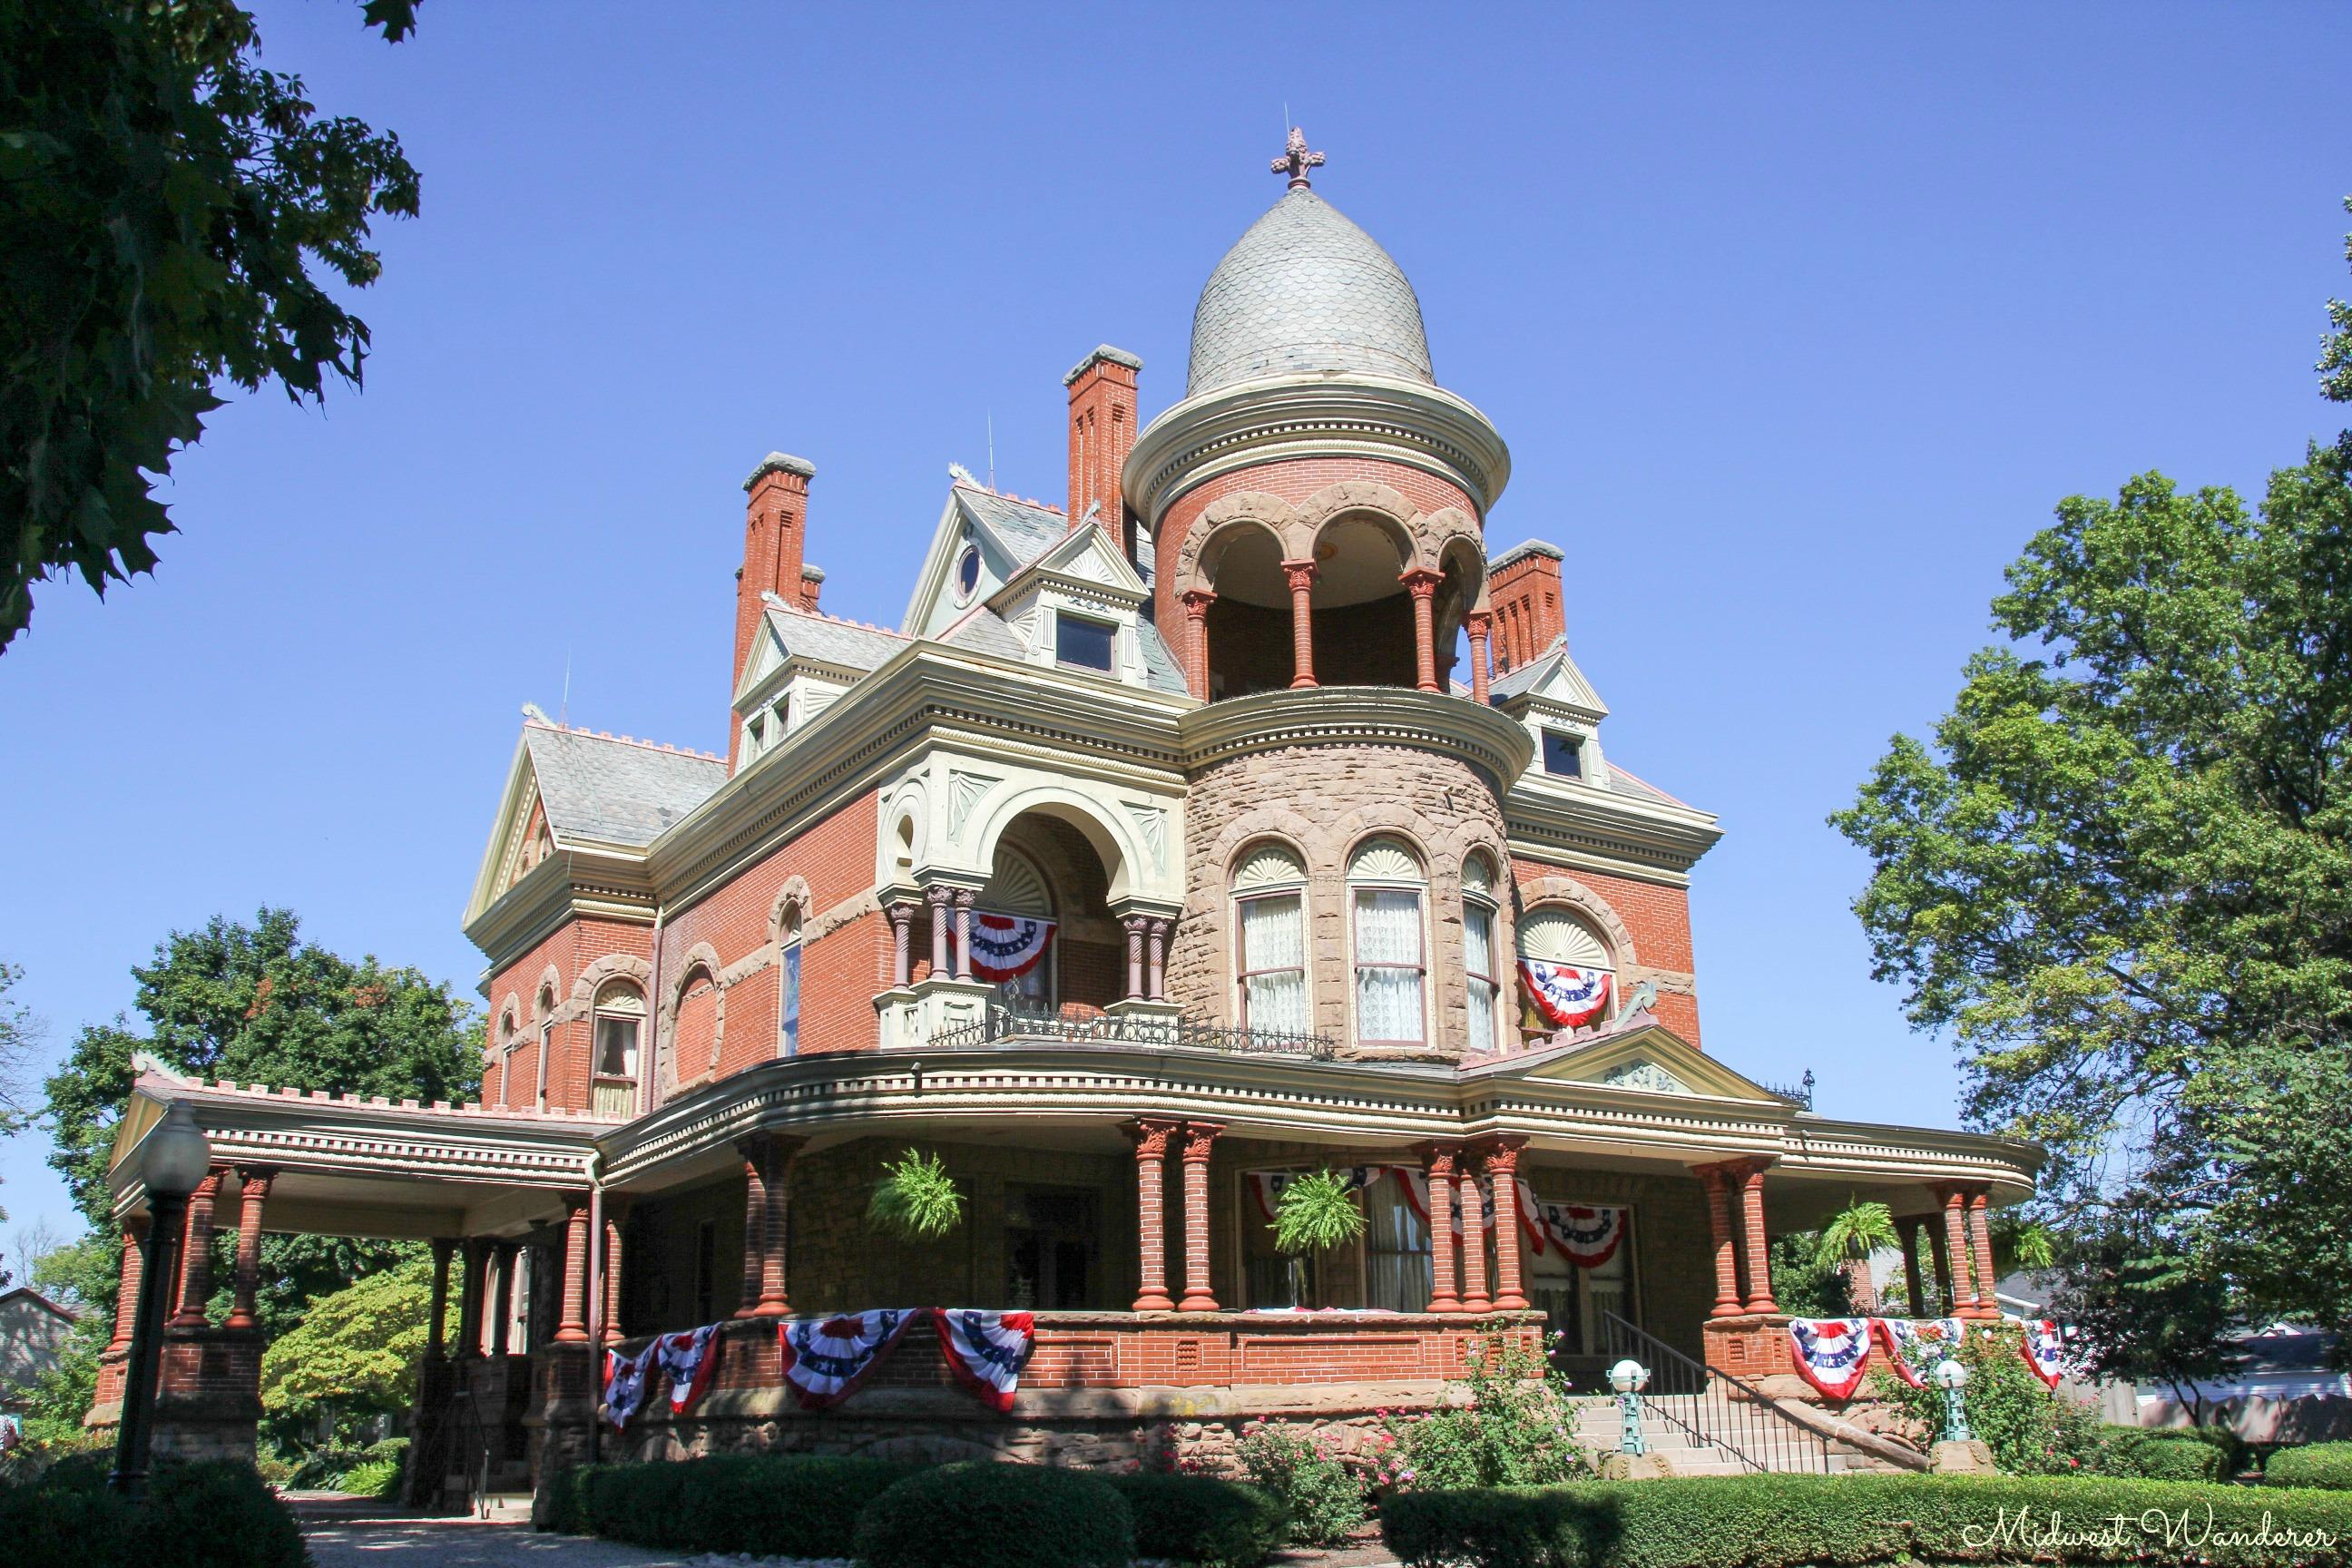 Seiberling Mansion exterior